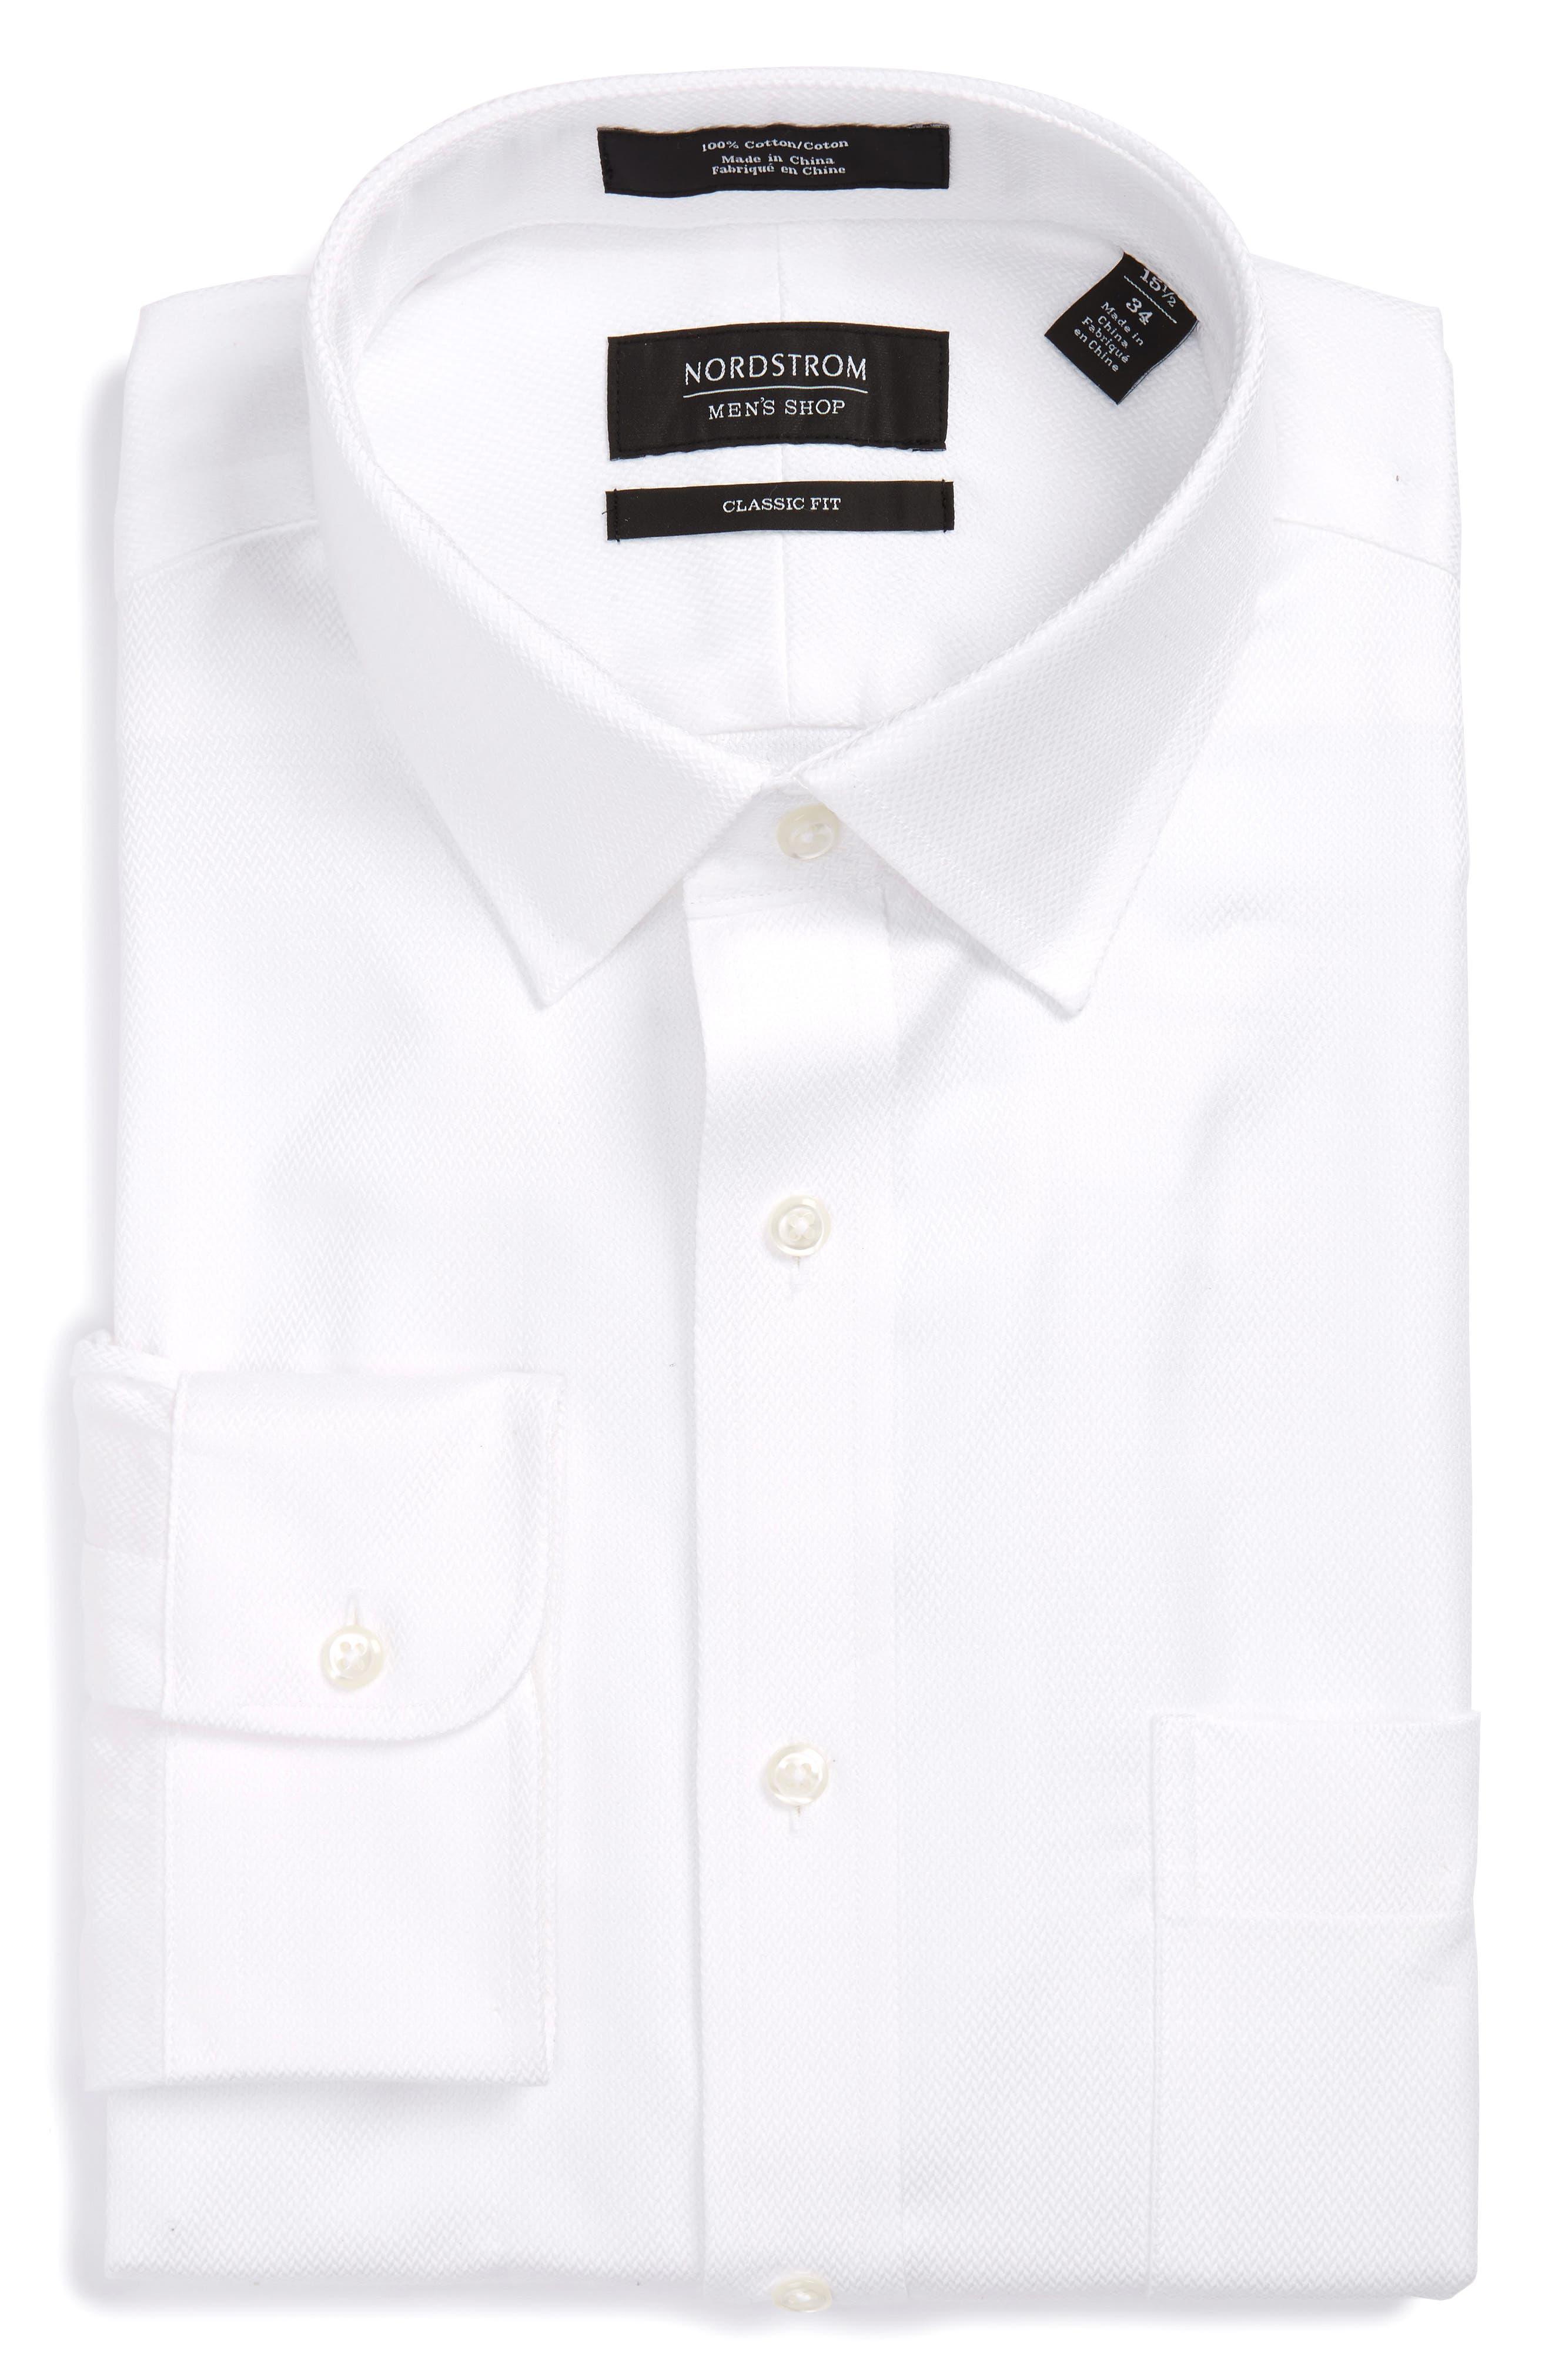 Main Image - Nordstrom Men's Shop Classic Fit Textured Dress Shirt